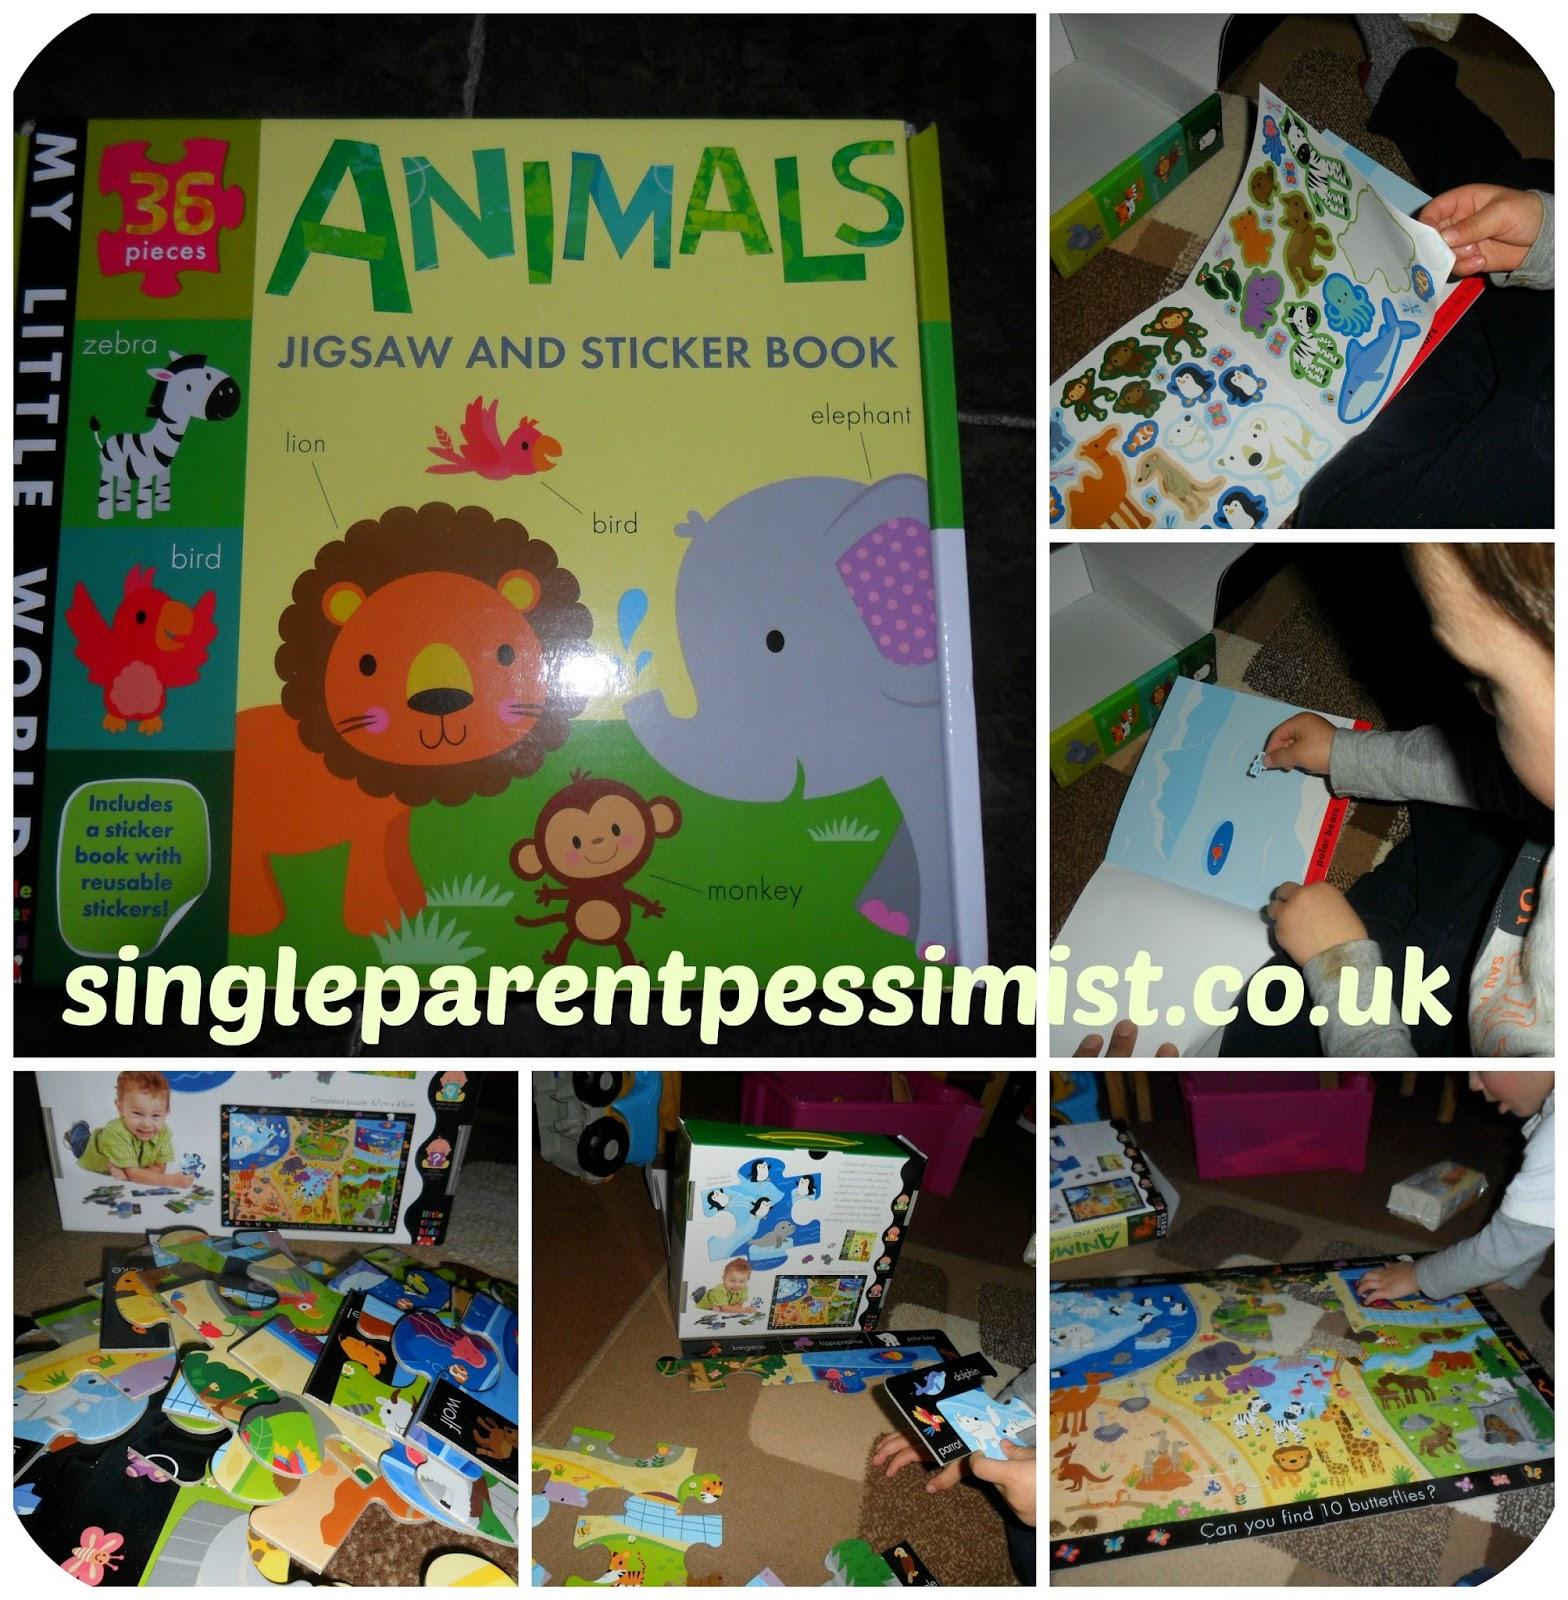 little tiger kids animal jigsaw and sticker book